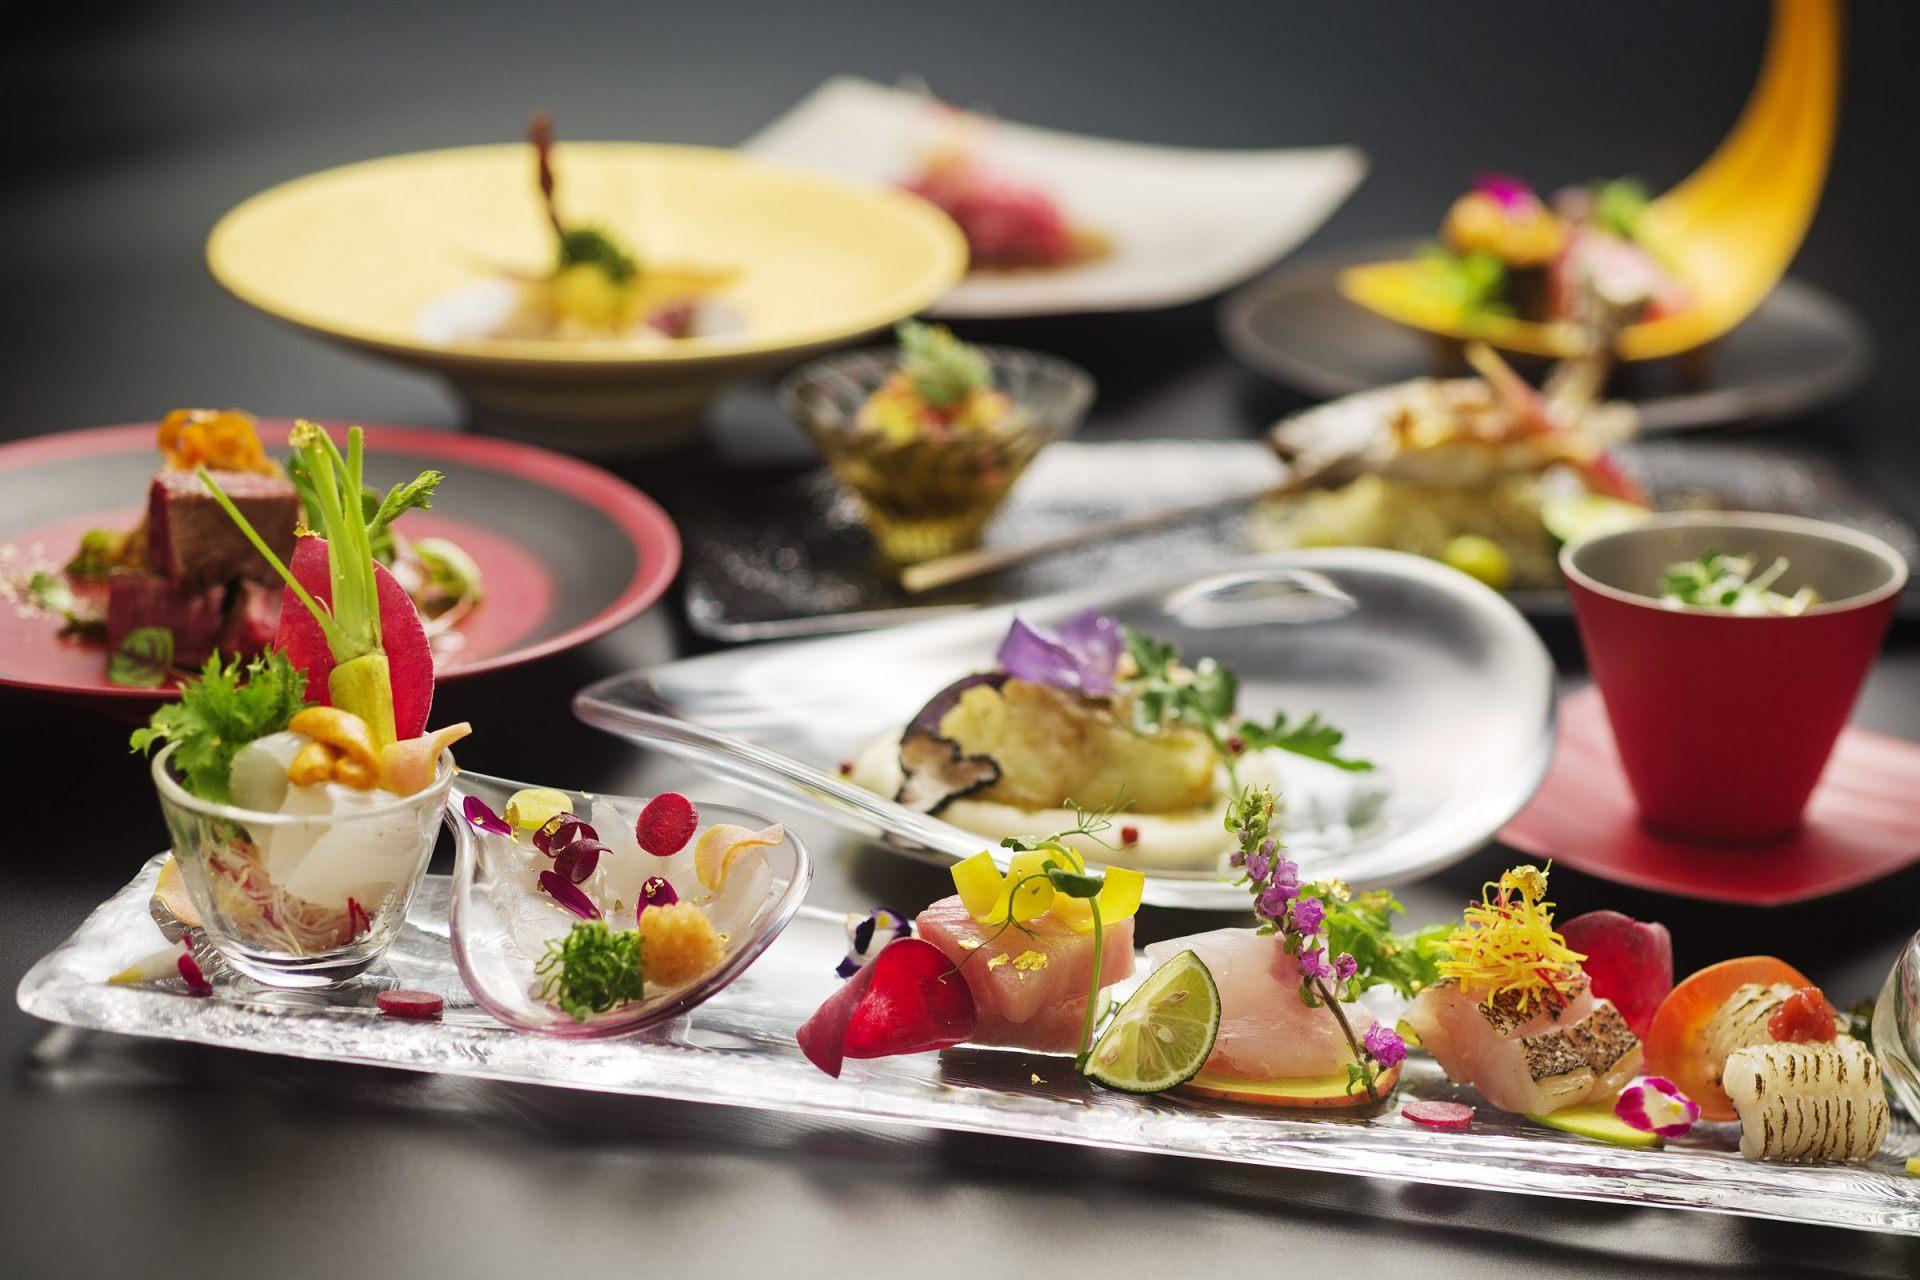 Generous servings of abalone, rock oysters, matsutake mushrooms and other seasonal ingredients.